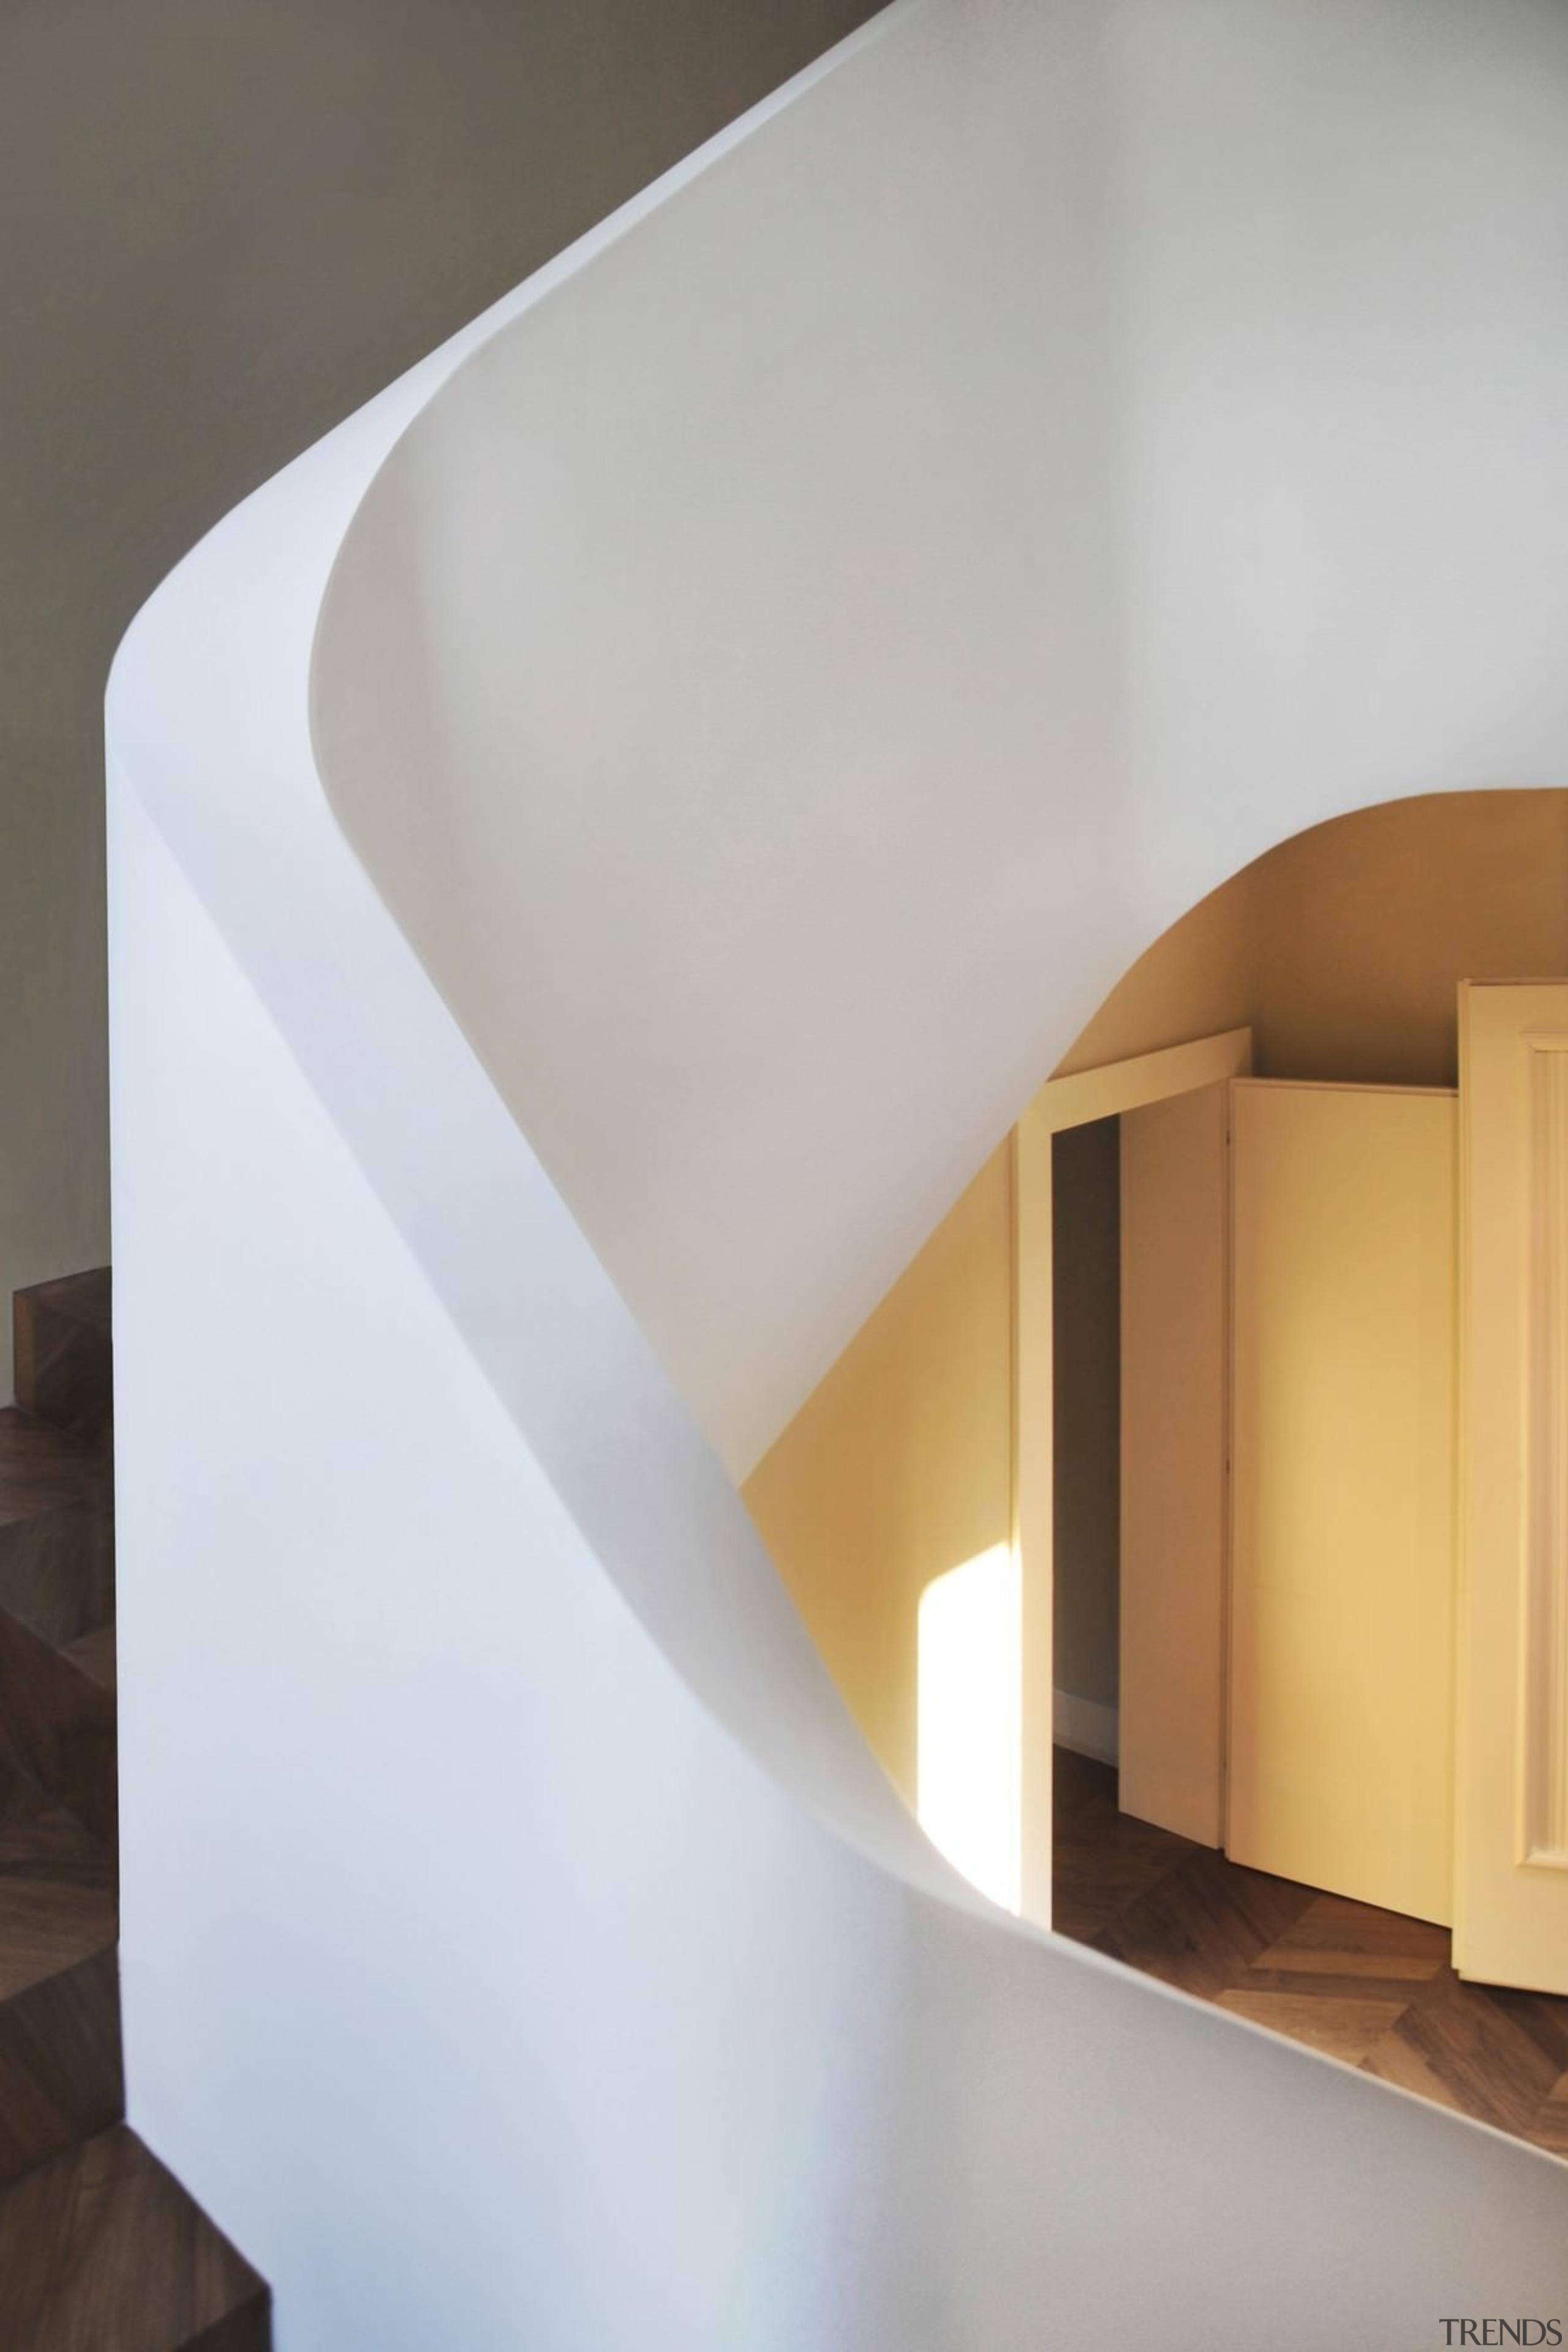 Architect: Tisselli Studio ArchitettiPhotography by Filippo Tisselli architecture, light fixture, lighting, product design, gray, white